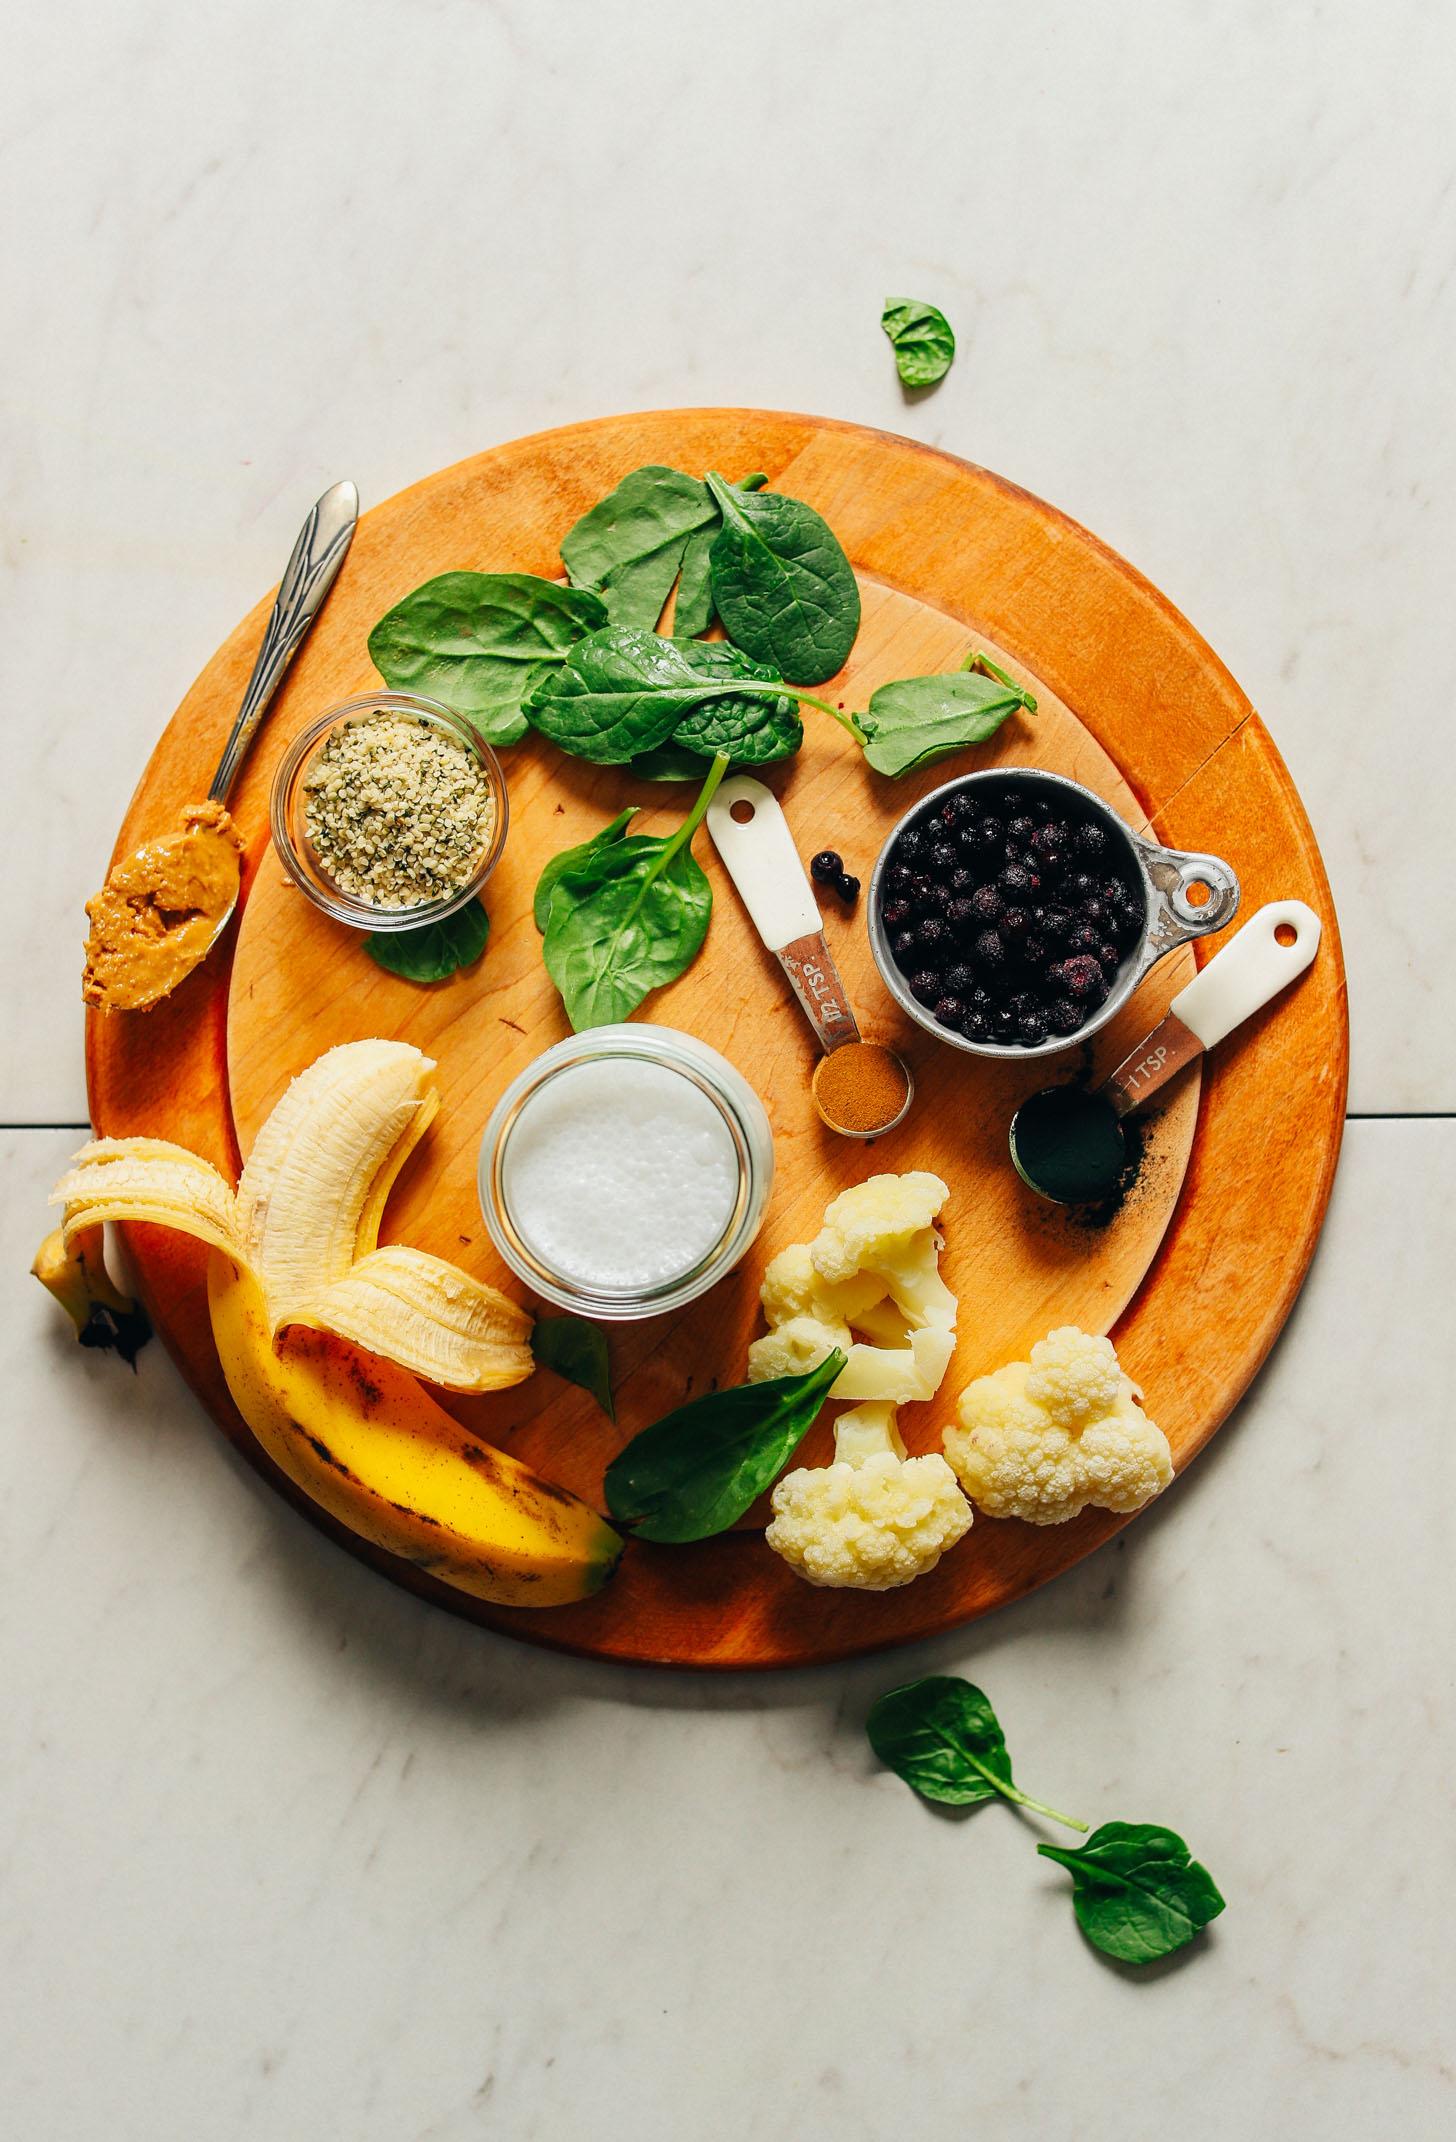 Banana, cauliflower, coconut milk, blueberries, spirulina, cinnamon, spinach, hemp seeds, and peanut butter for making vegan smoothie bowls